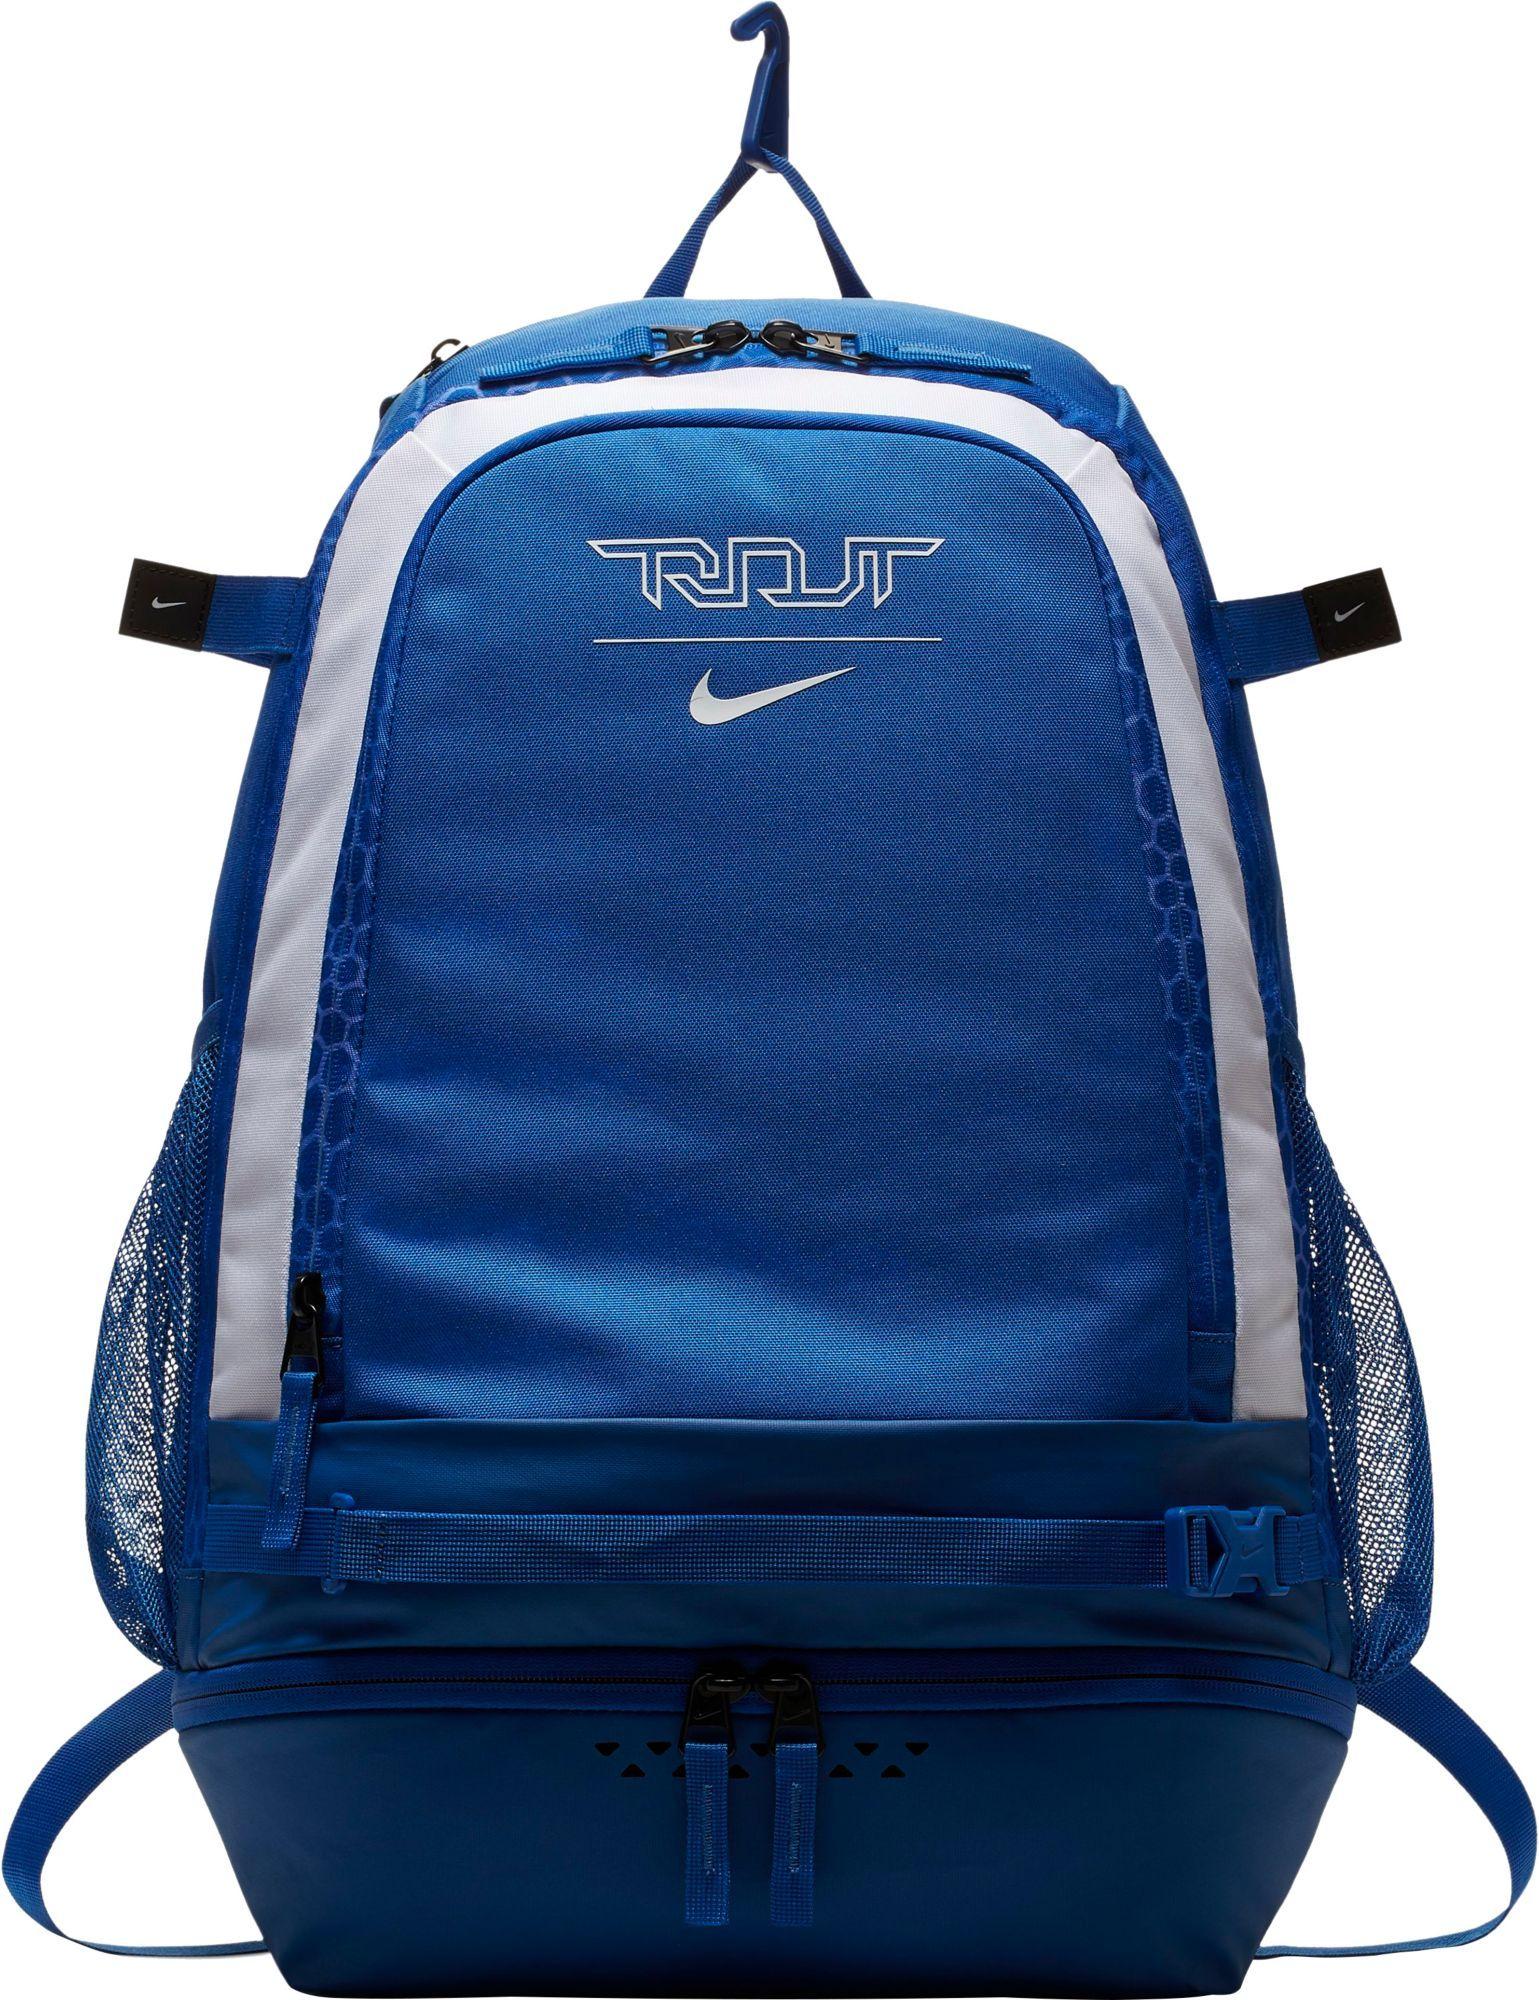 56306c88347 Nike Trout Vapor Bat Pack 2019 in 2018